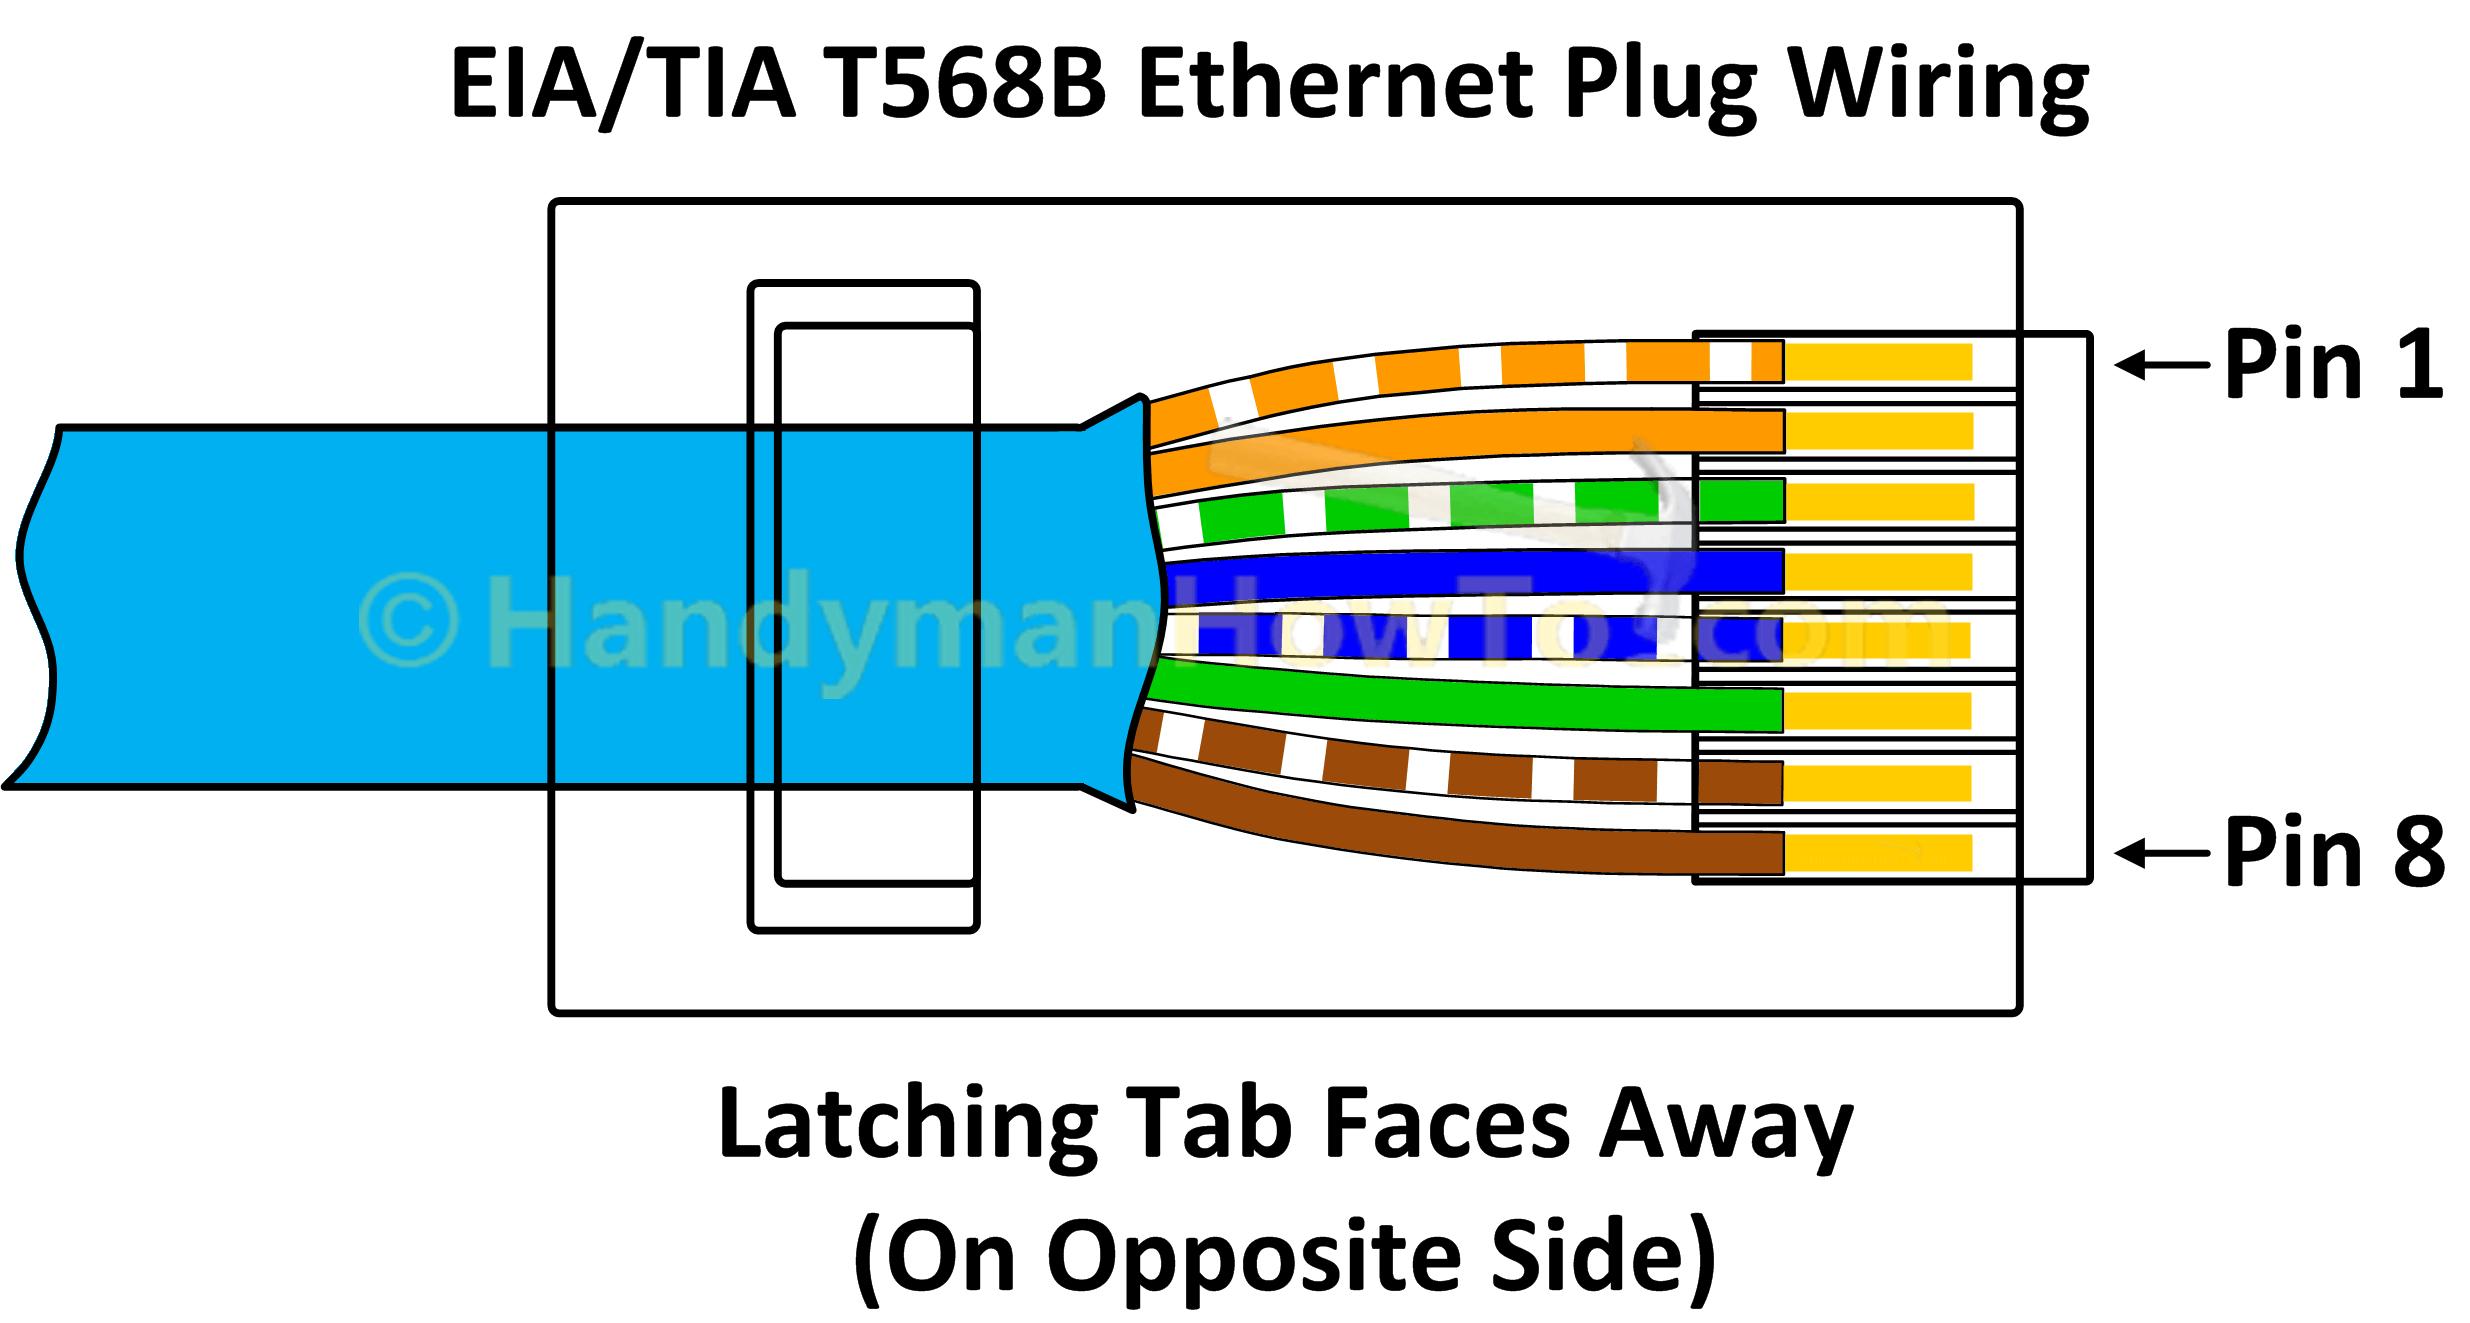 Cat 6 Plug Wiring - Data Wiring Diagram Site - Cat 6 Wiring Diagram